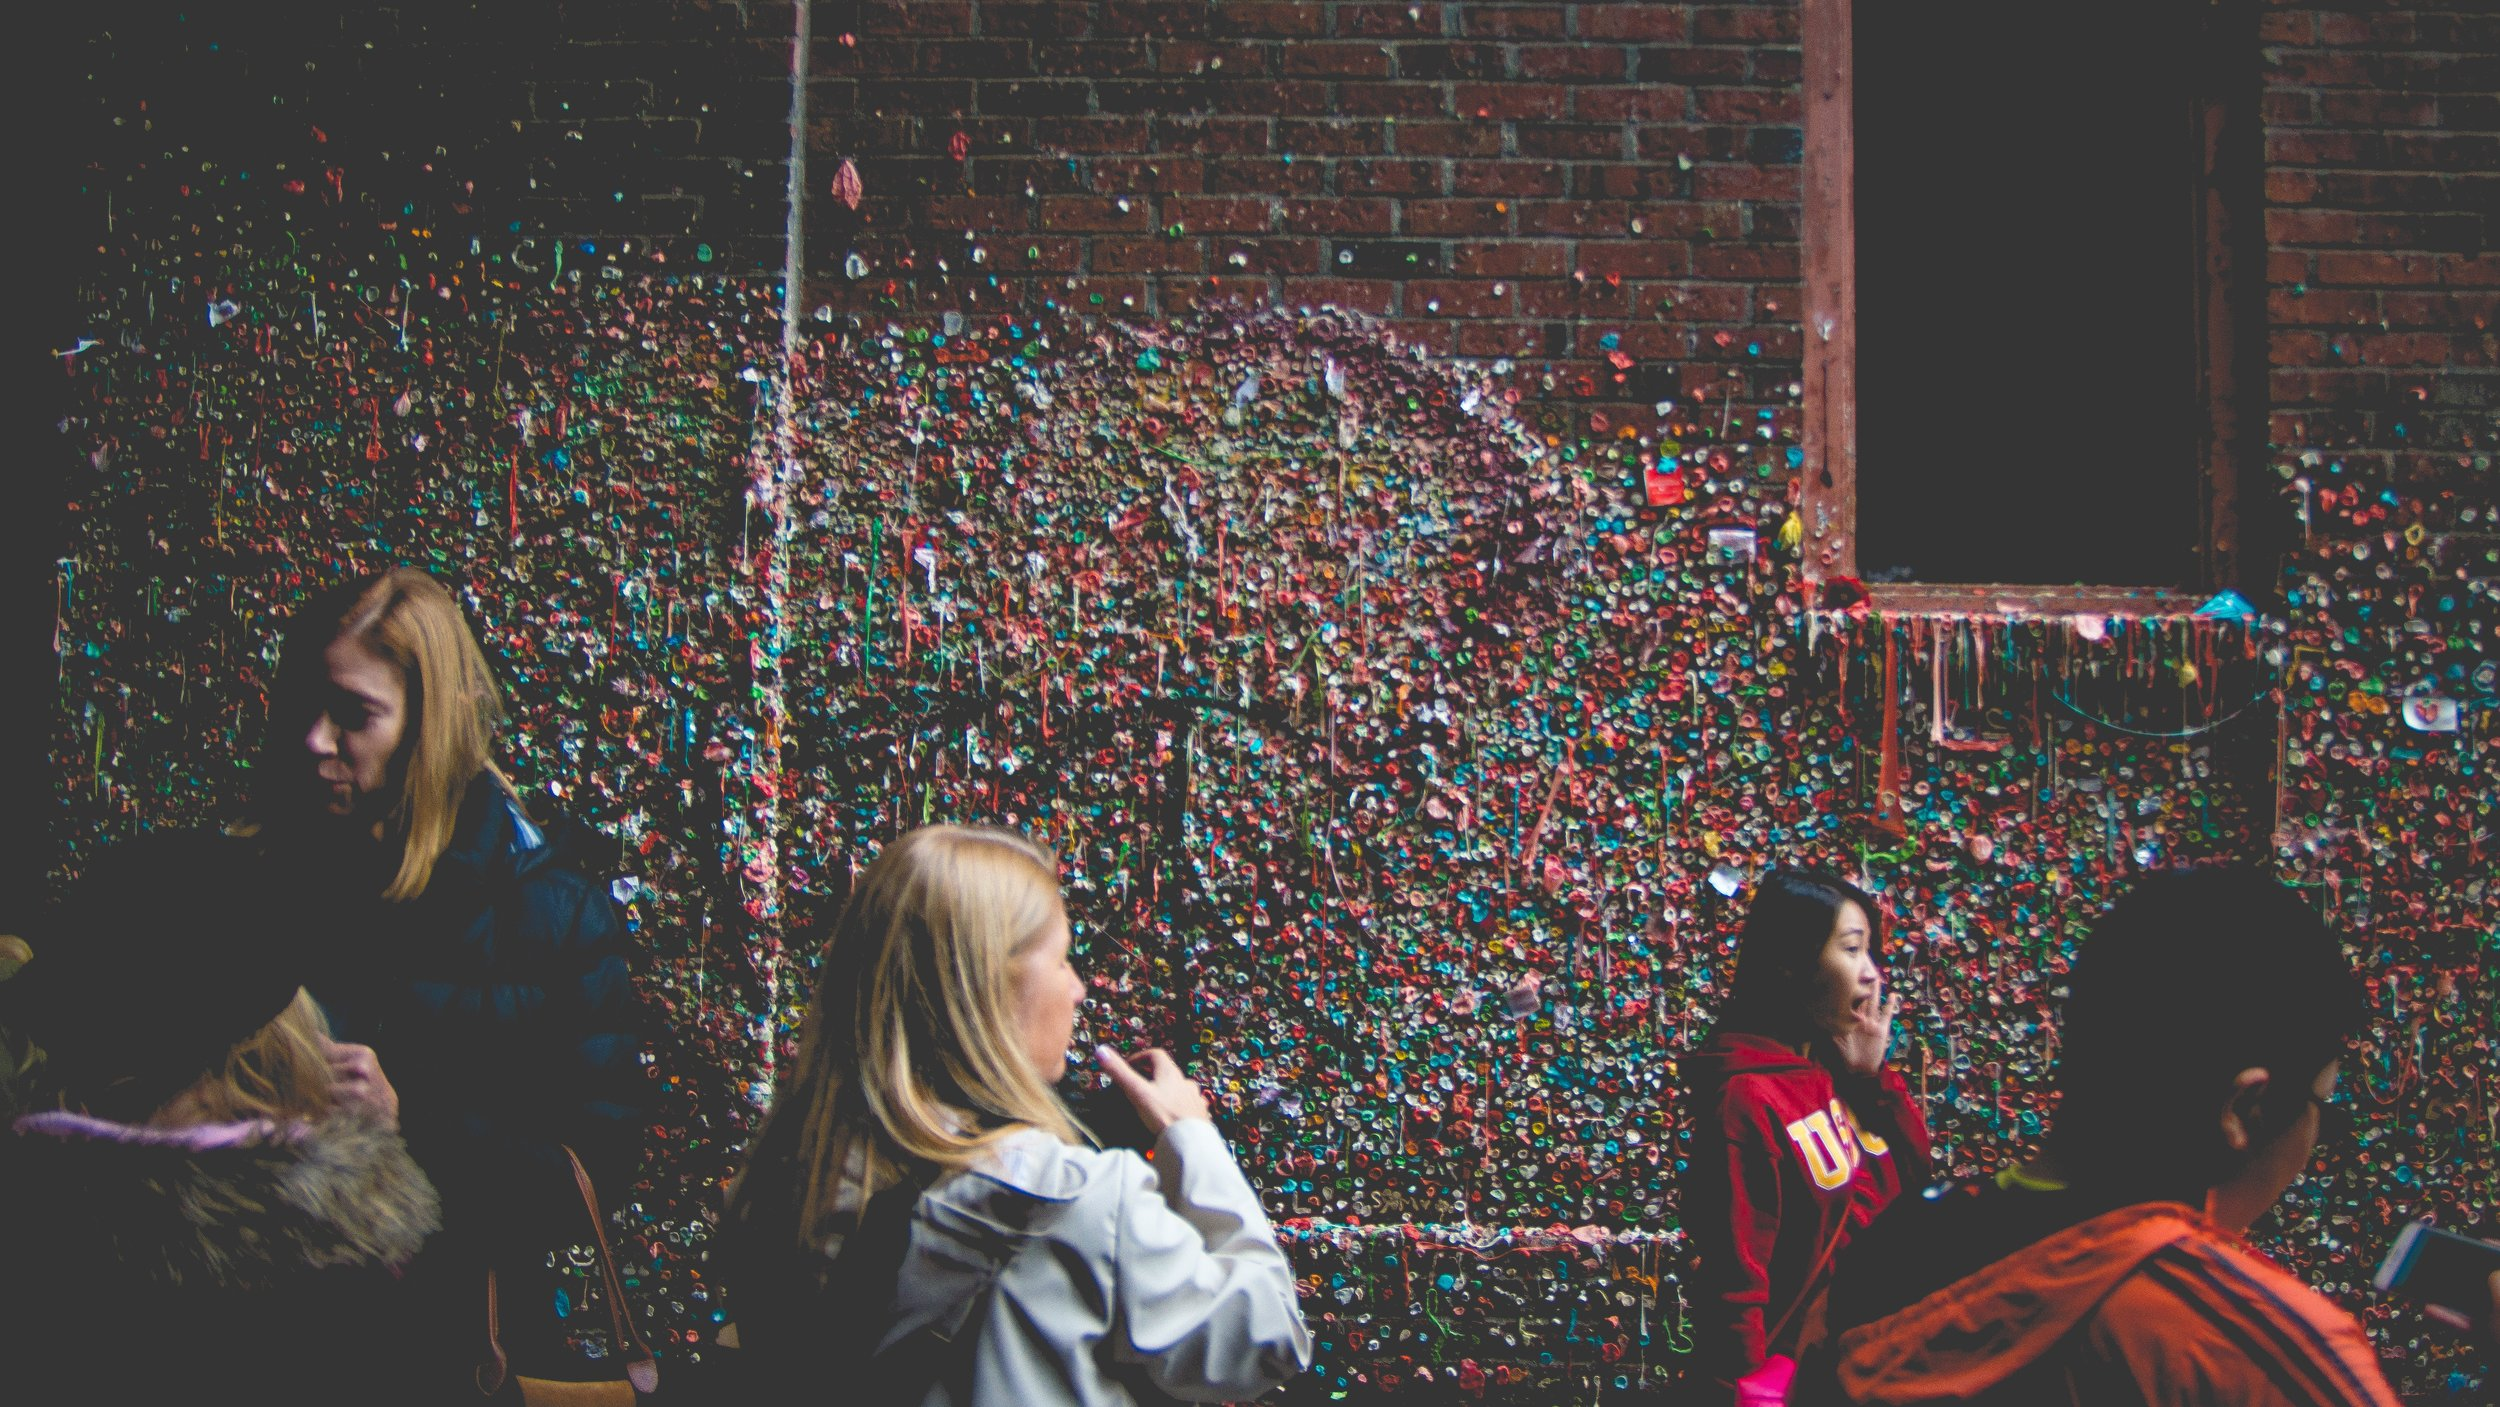 Pike Place Gum Wall.jpg